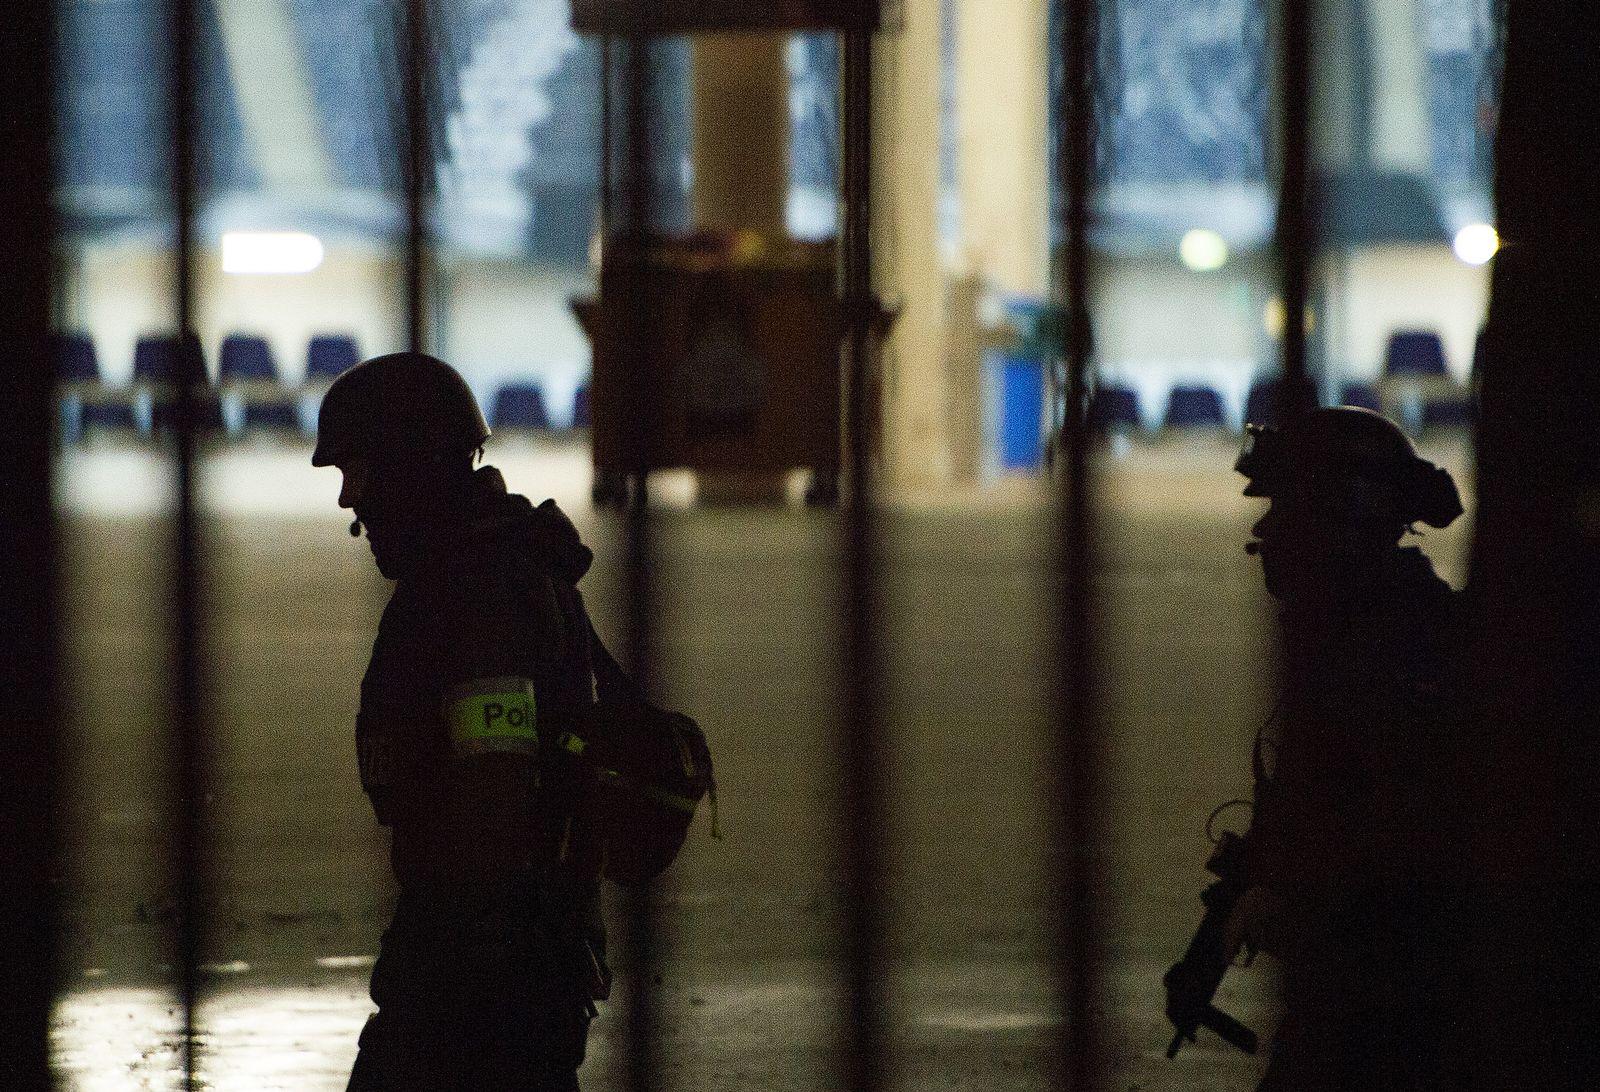 POLIZEI HANNOVER TERROR